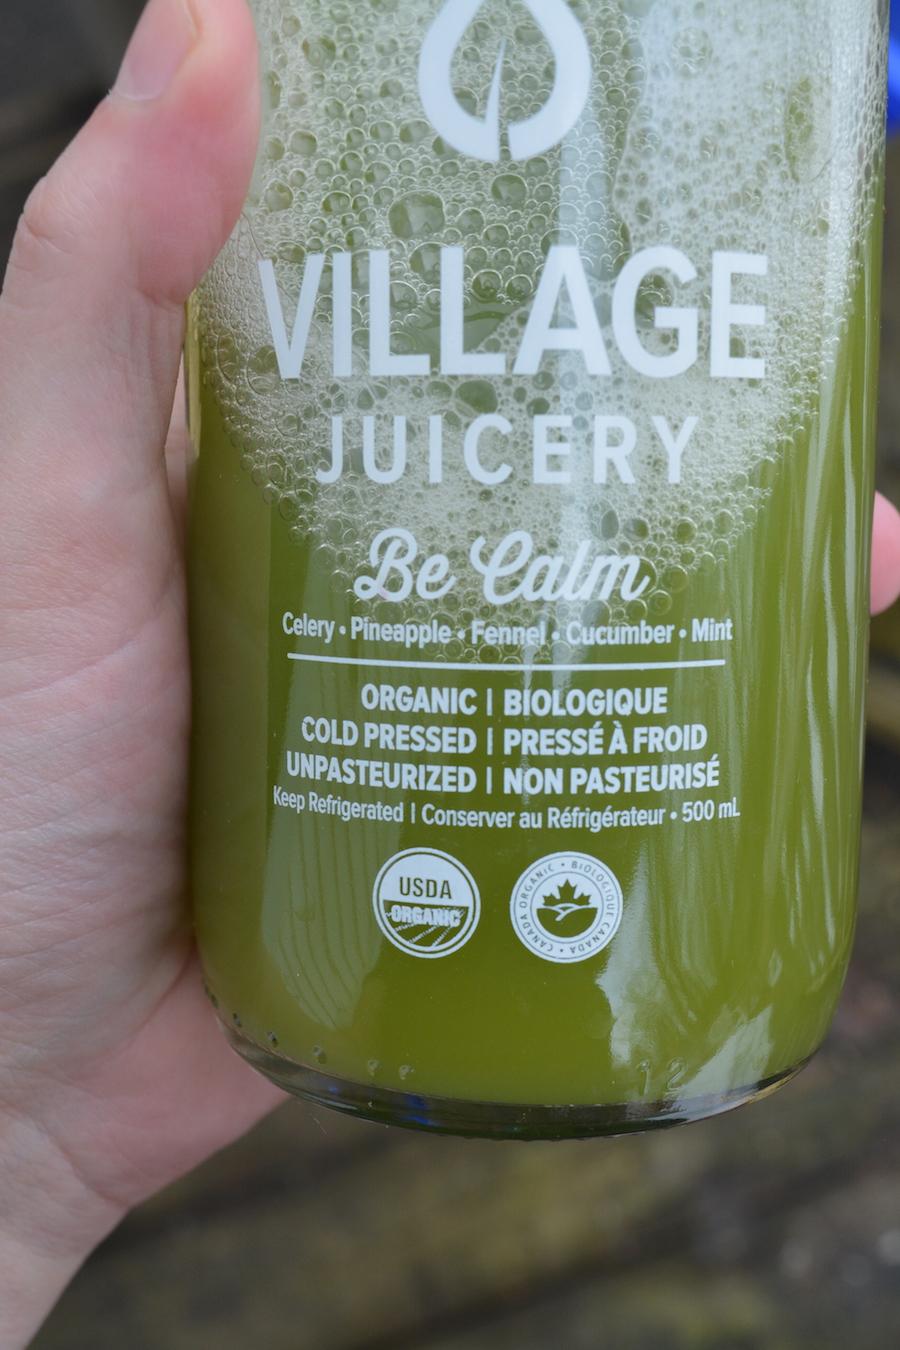 Be Calm juice by Village Juicery